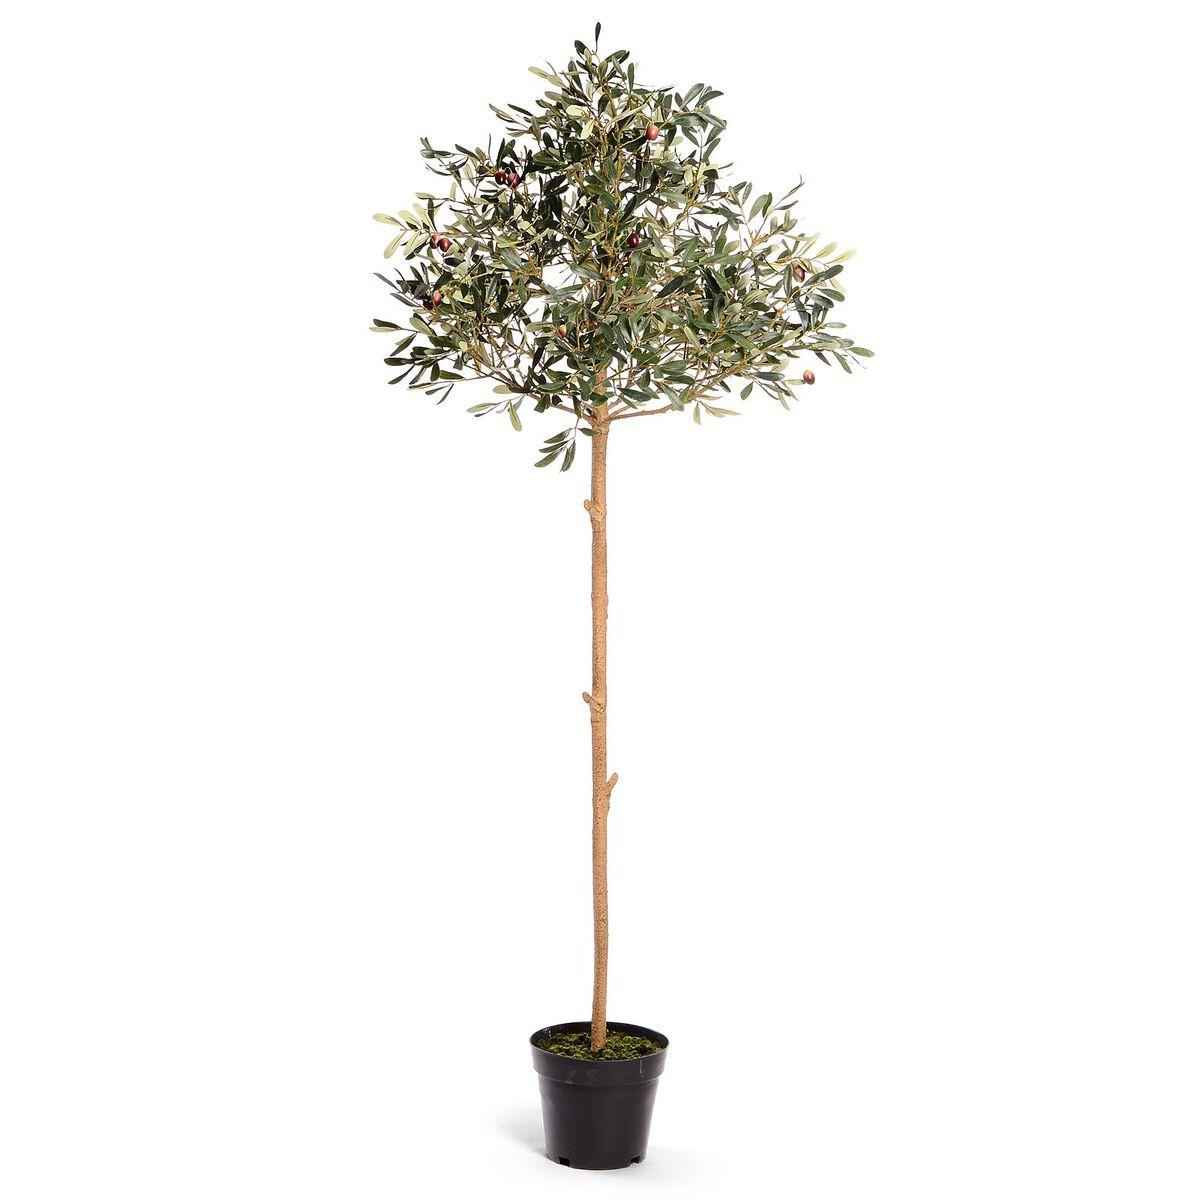 olivenbaum in topf ca l 1 56m dunkelgr n depot de. Black Bedroom Furniture Sets. Home Design Ideas